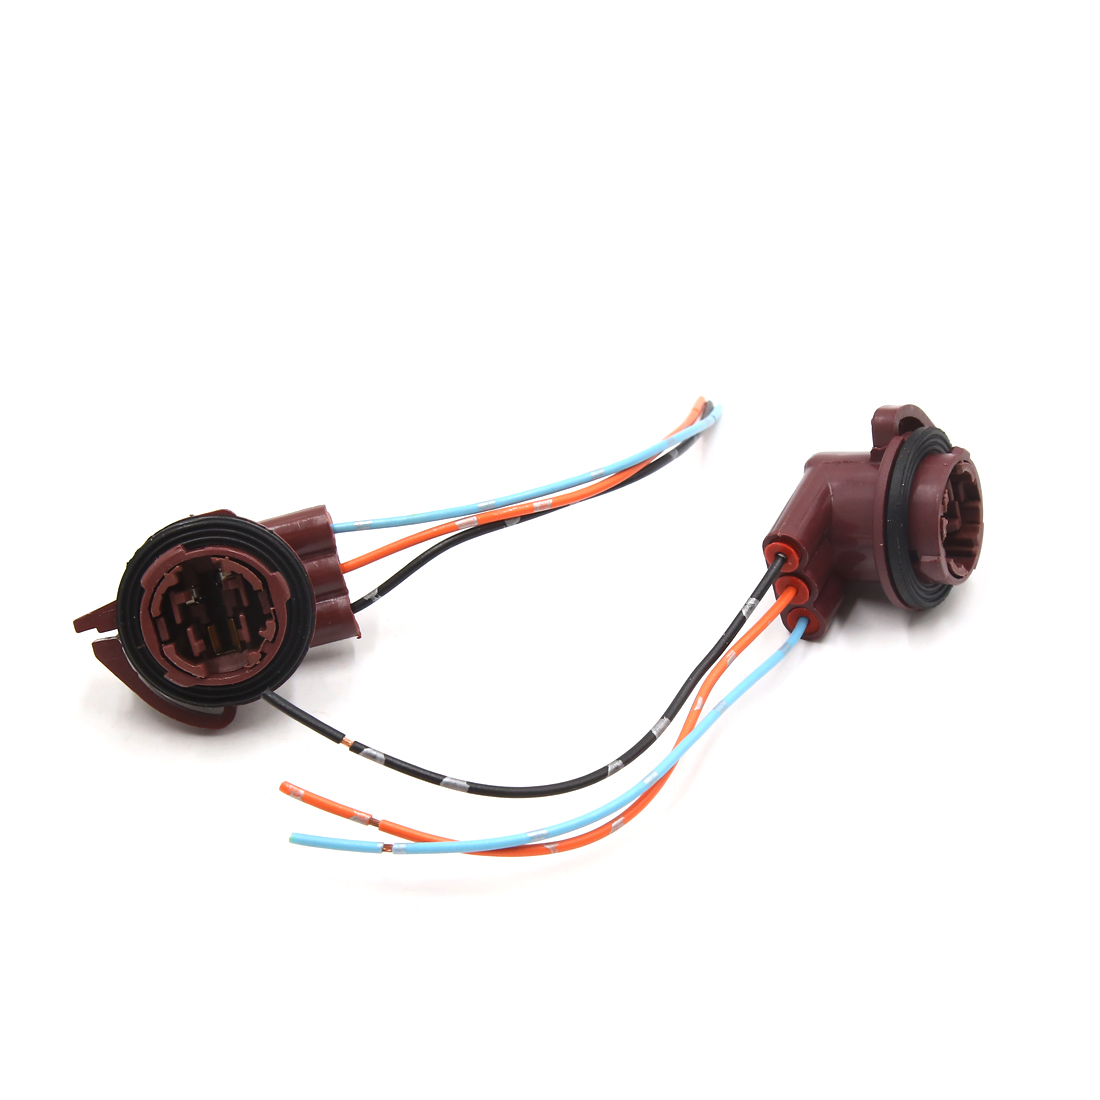 medium resolution of 2pcs 3157 brake light bulb extension wiring harness socket connector for car walmart canada